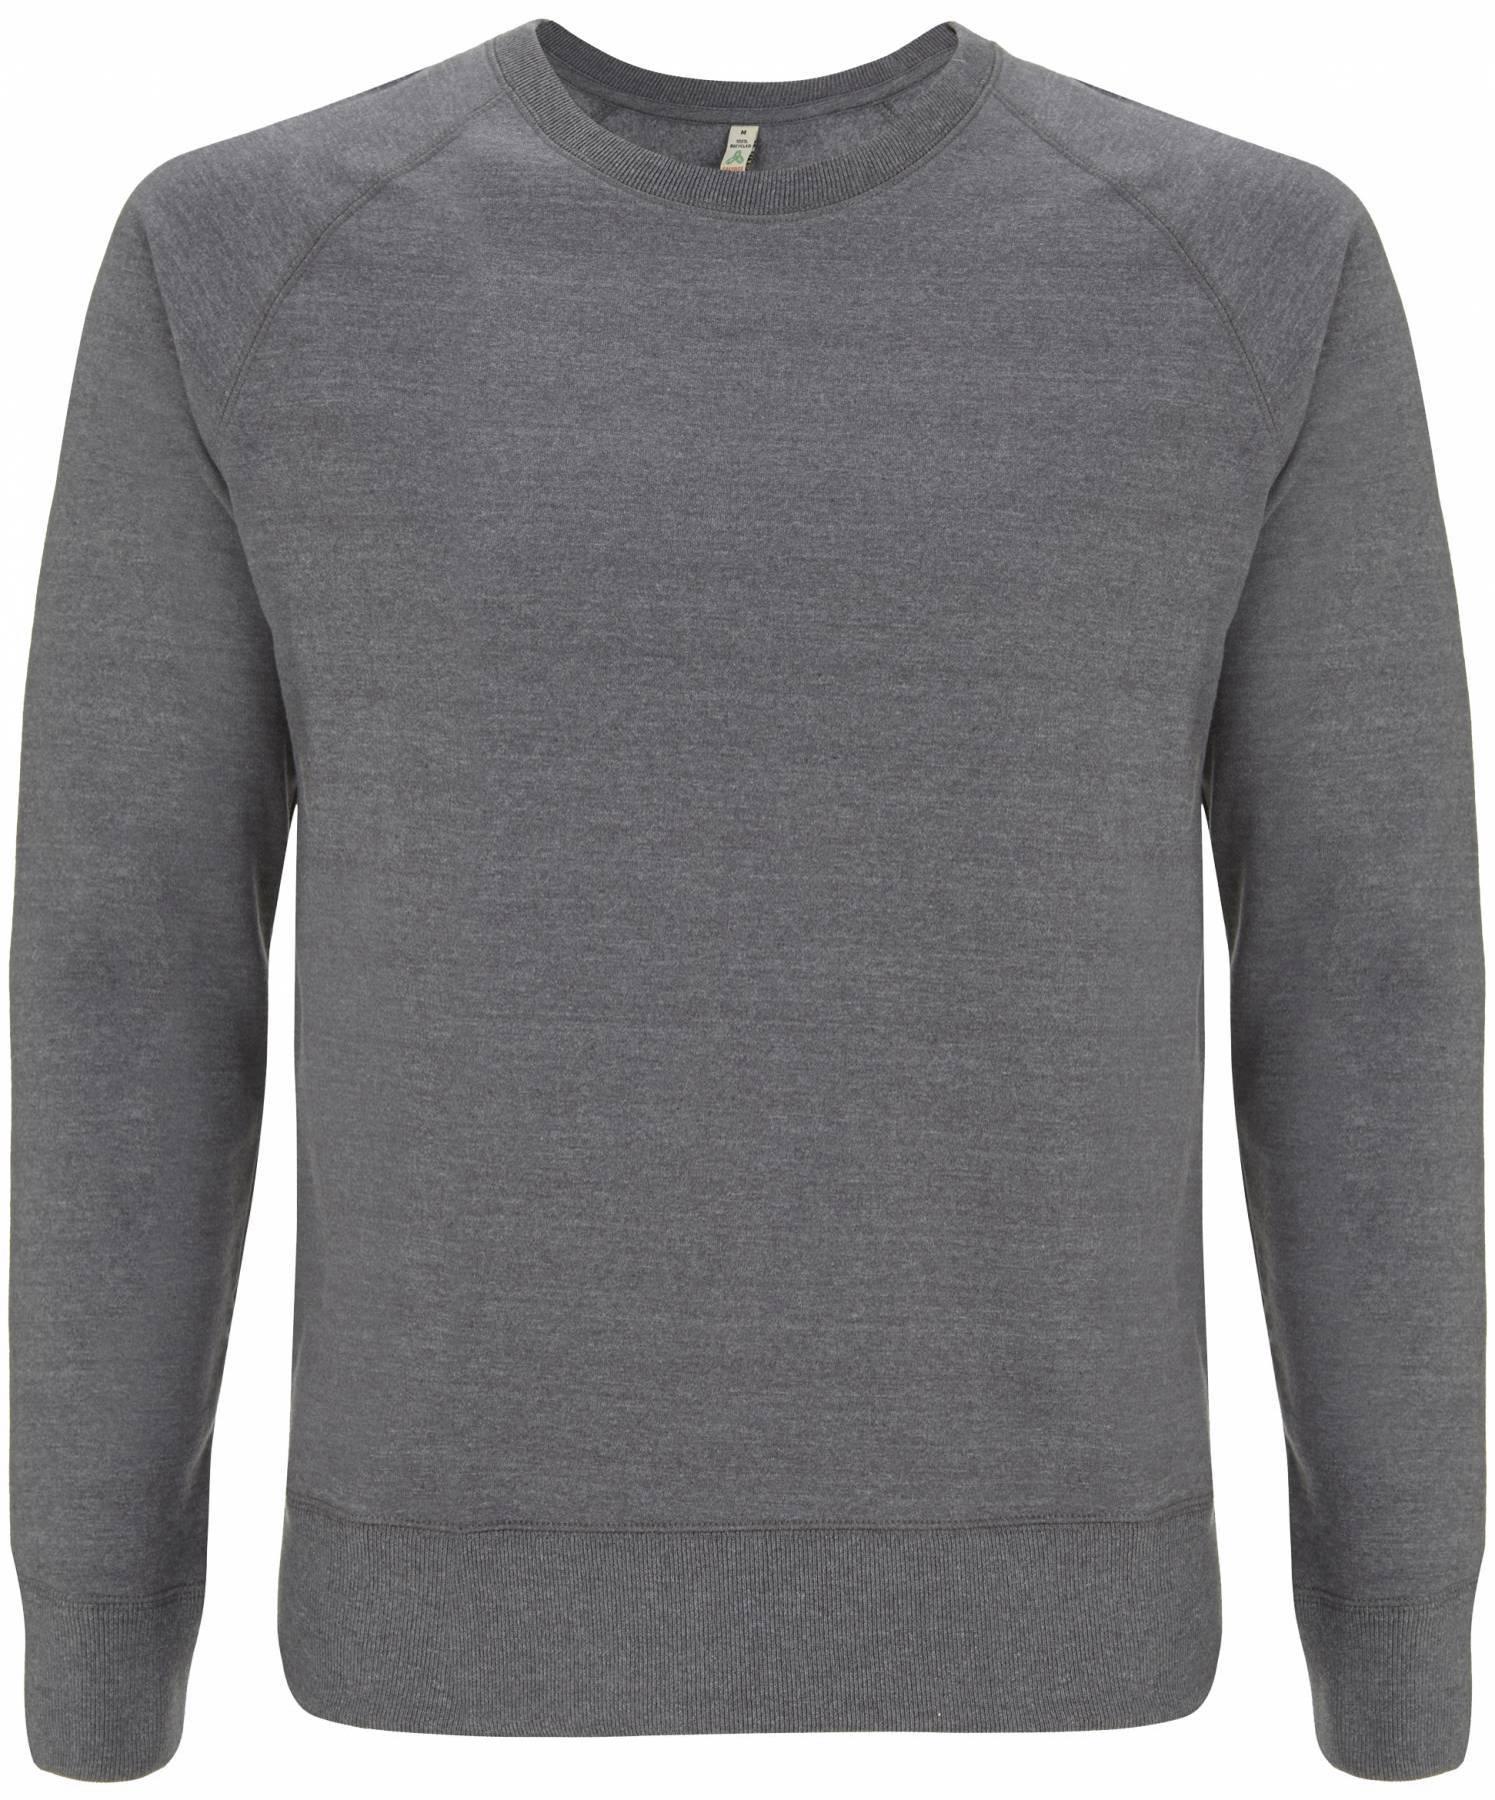 Raglan Classic Fit Sweatshirt